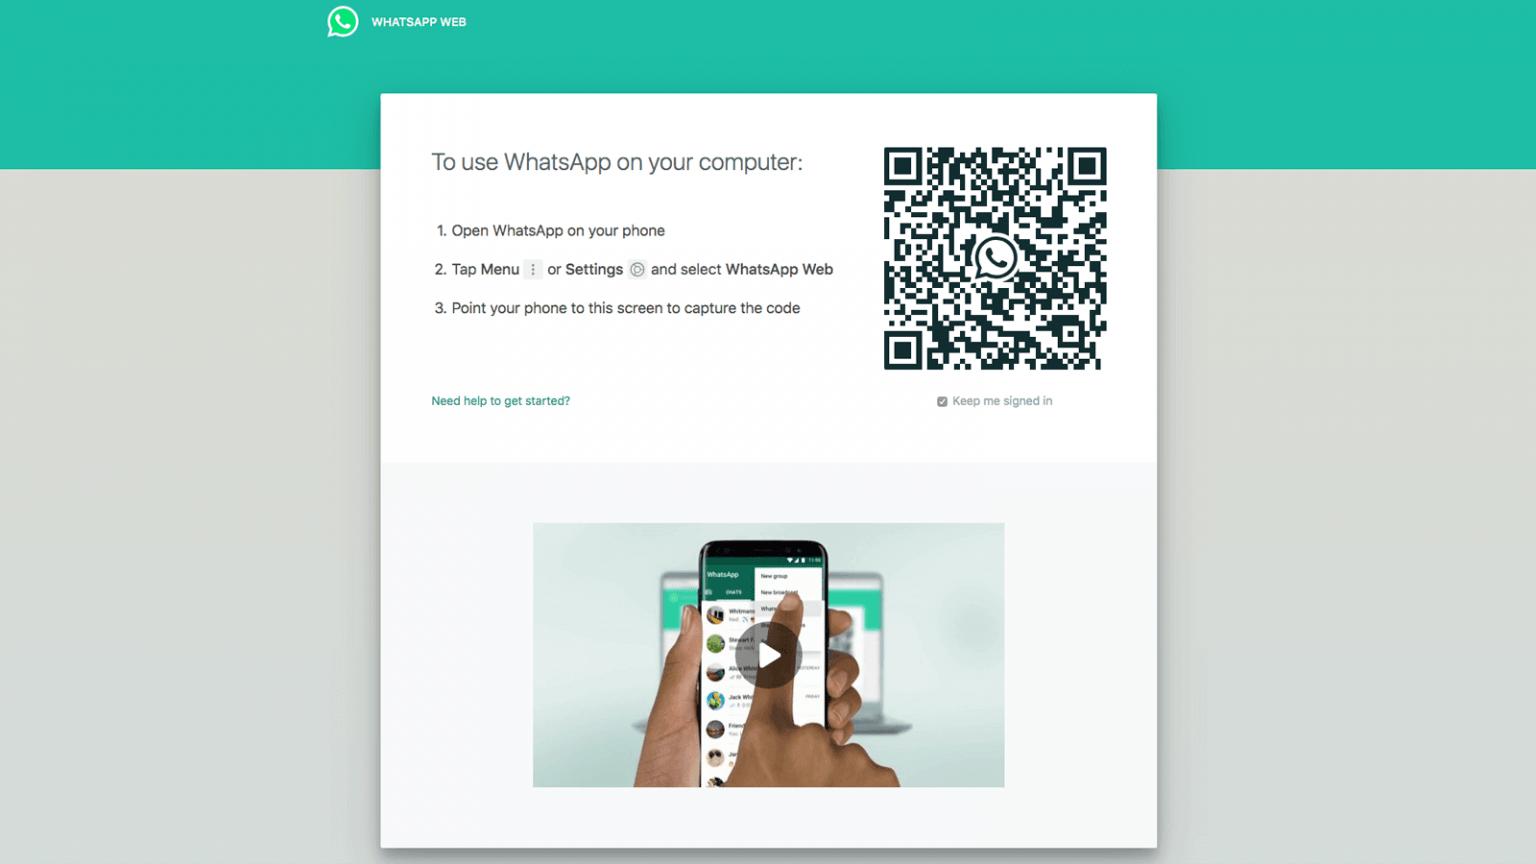 Cara Pakai Whatsapp Web Untuk Memaksimalkan WFH - Anon Gallery